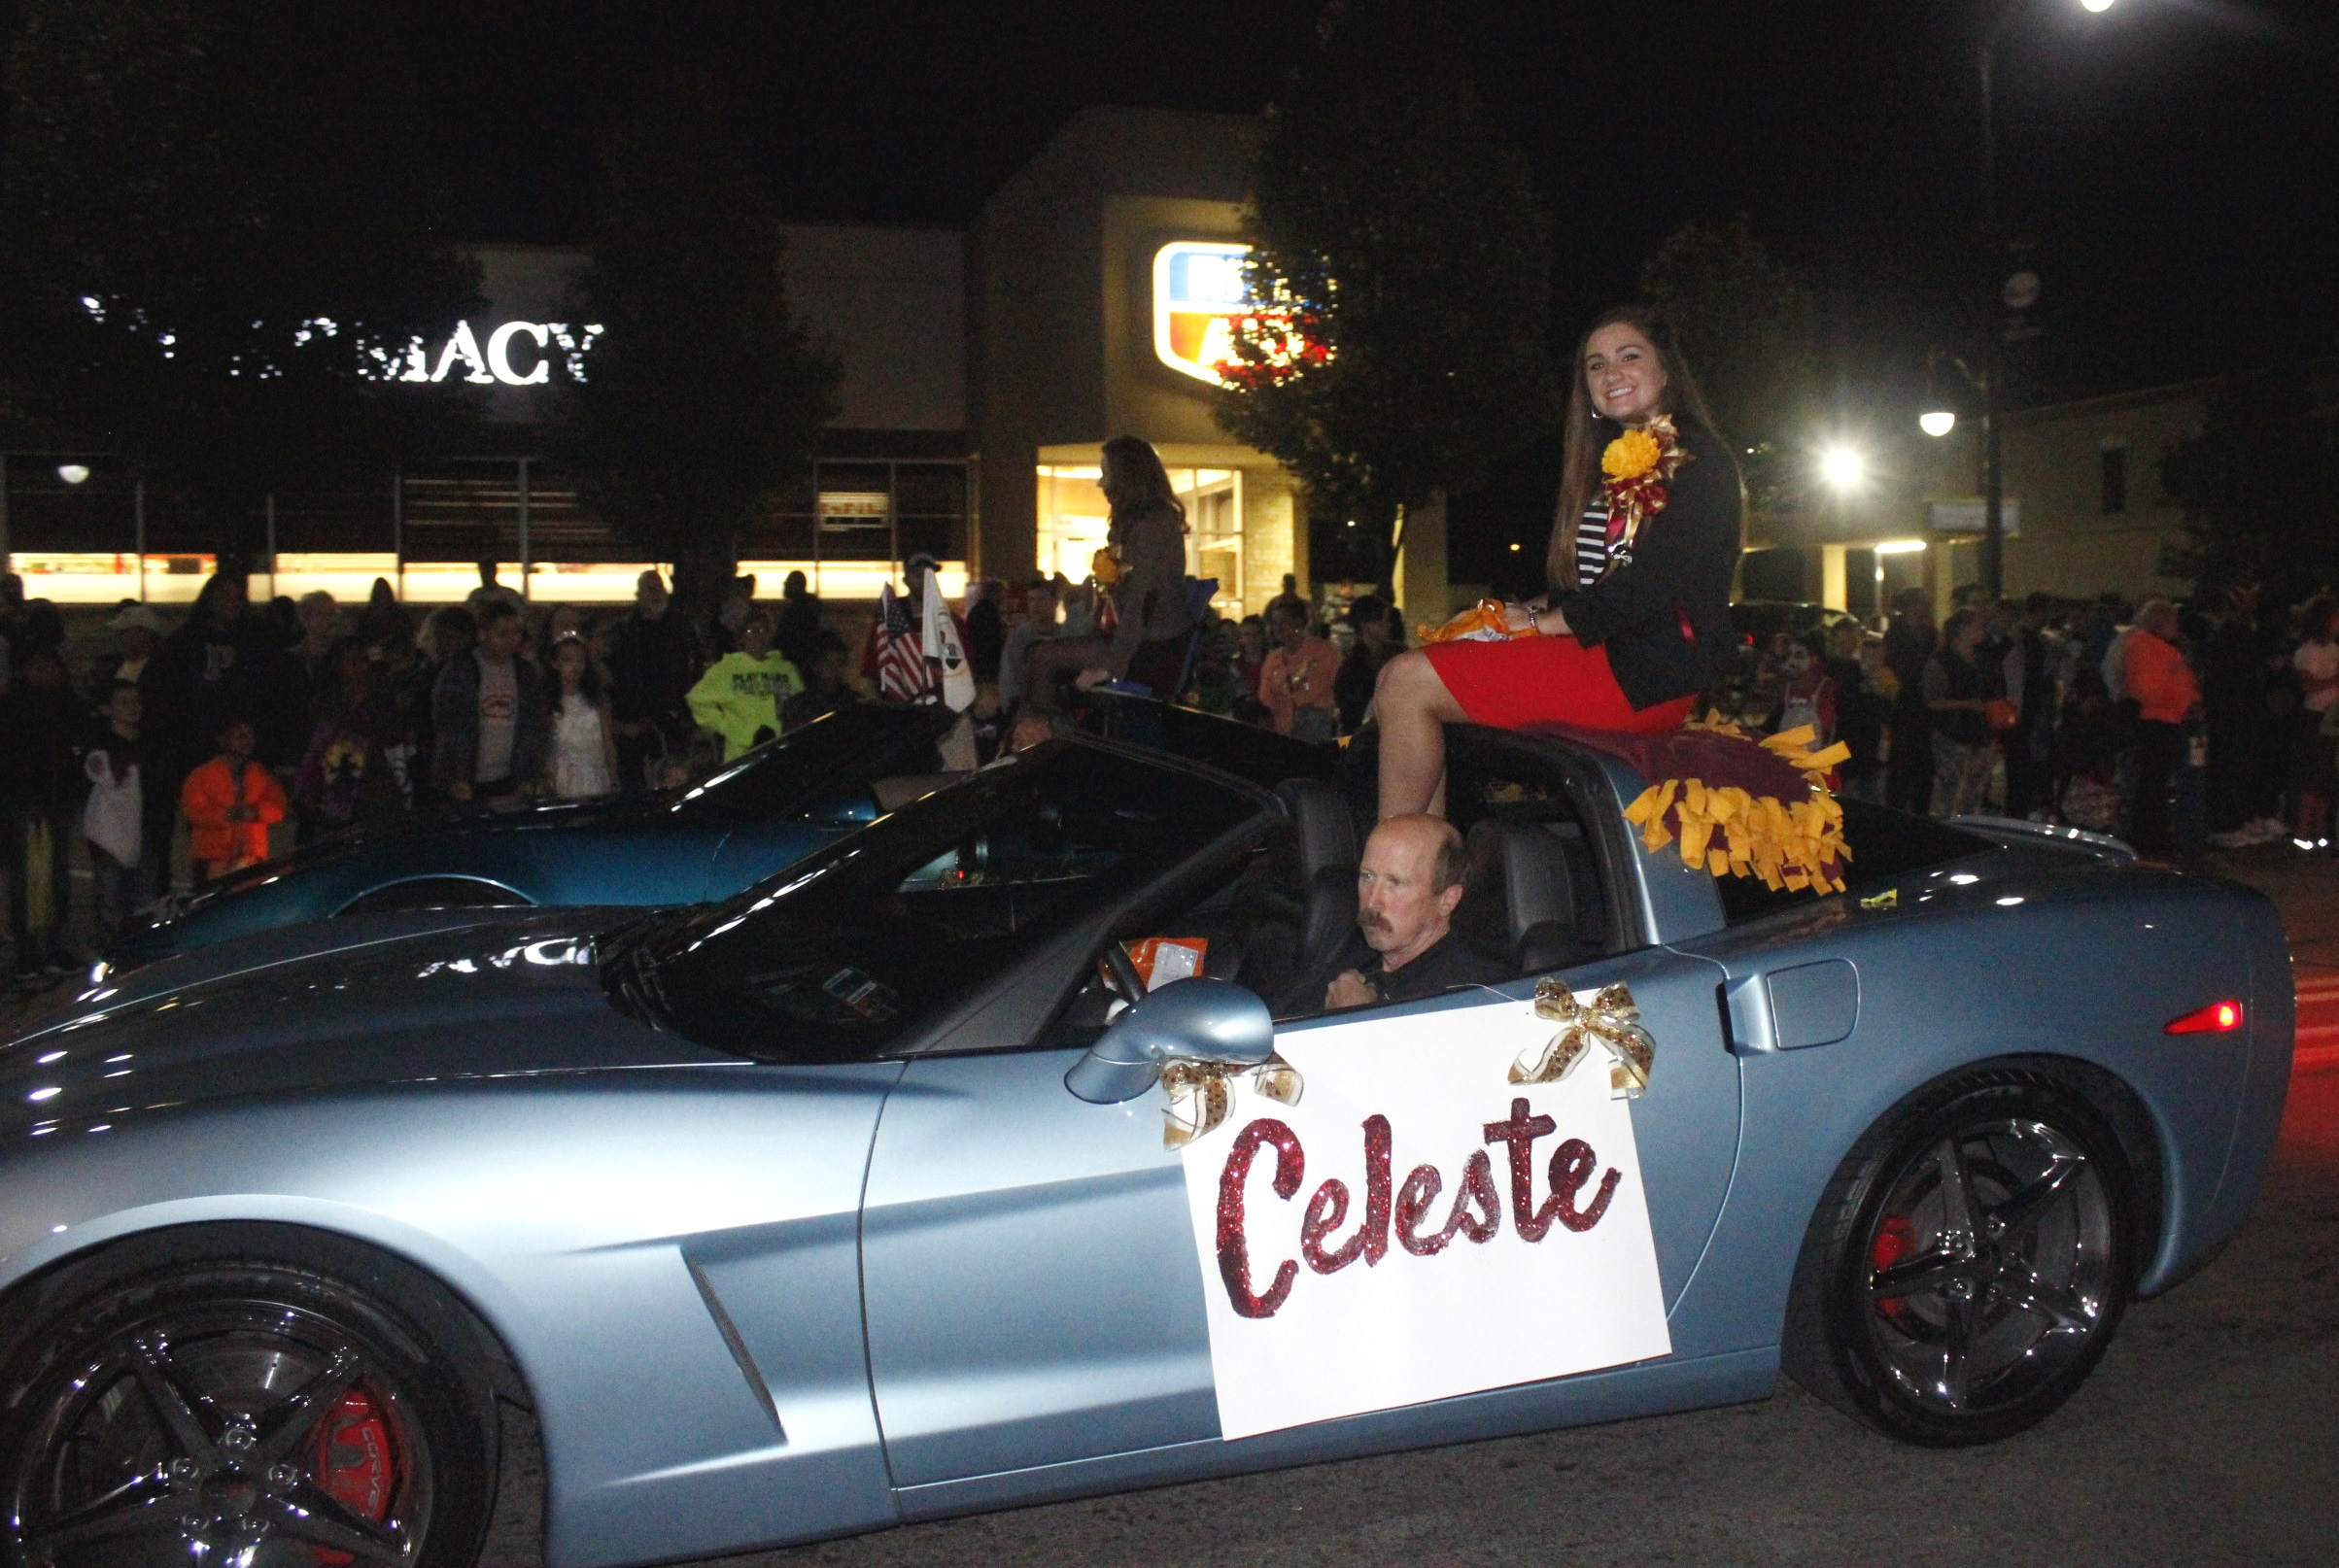 Celeste corvette